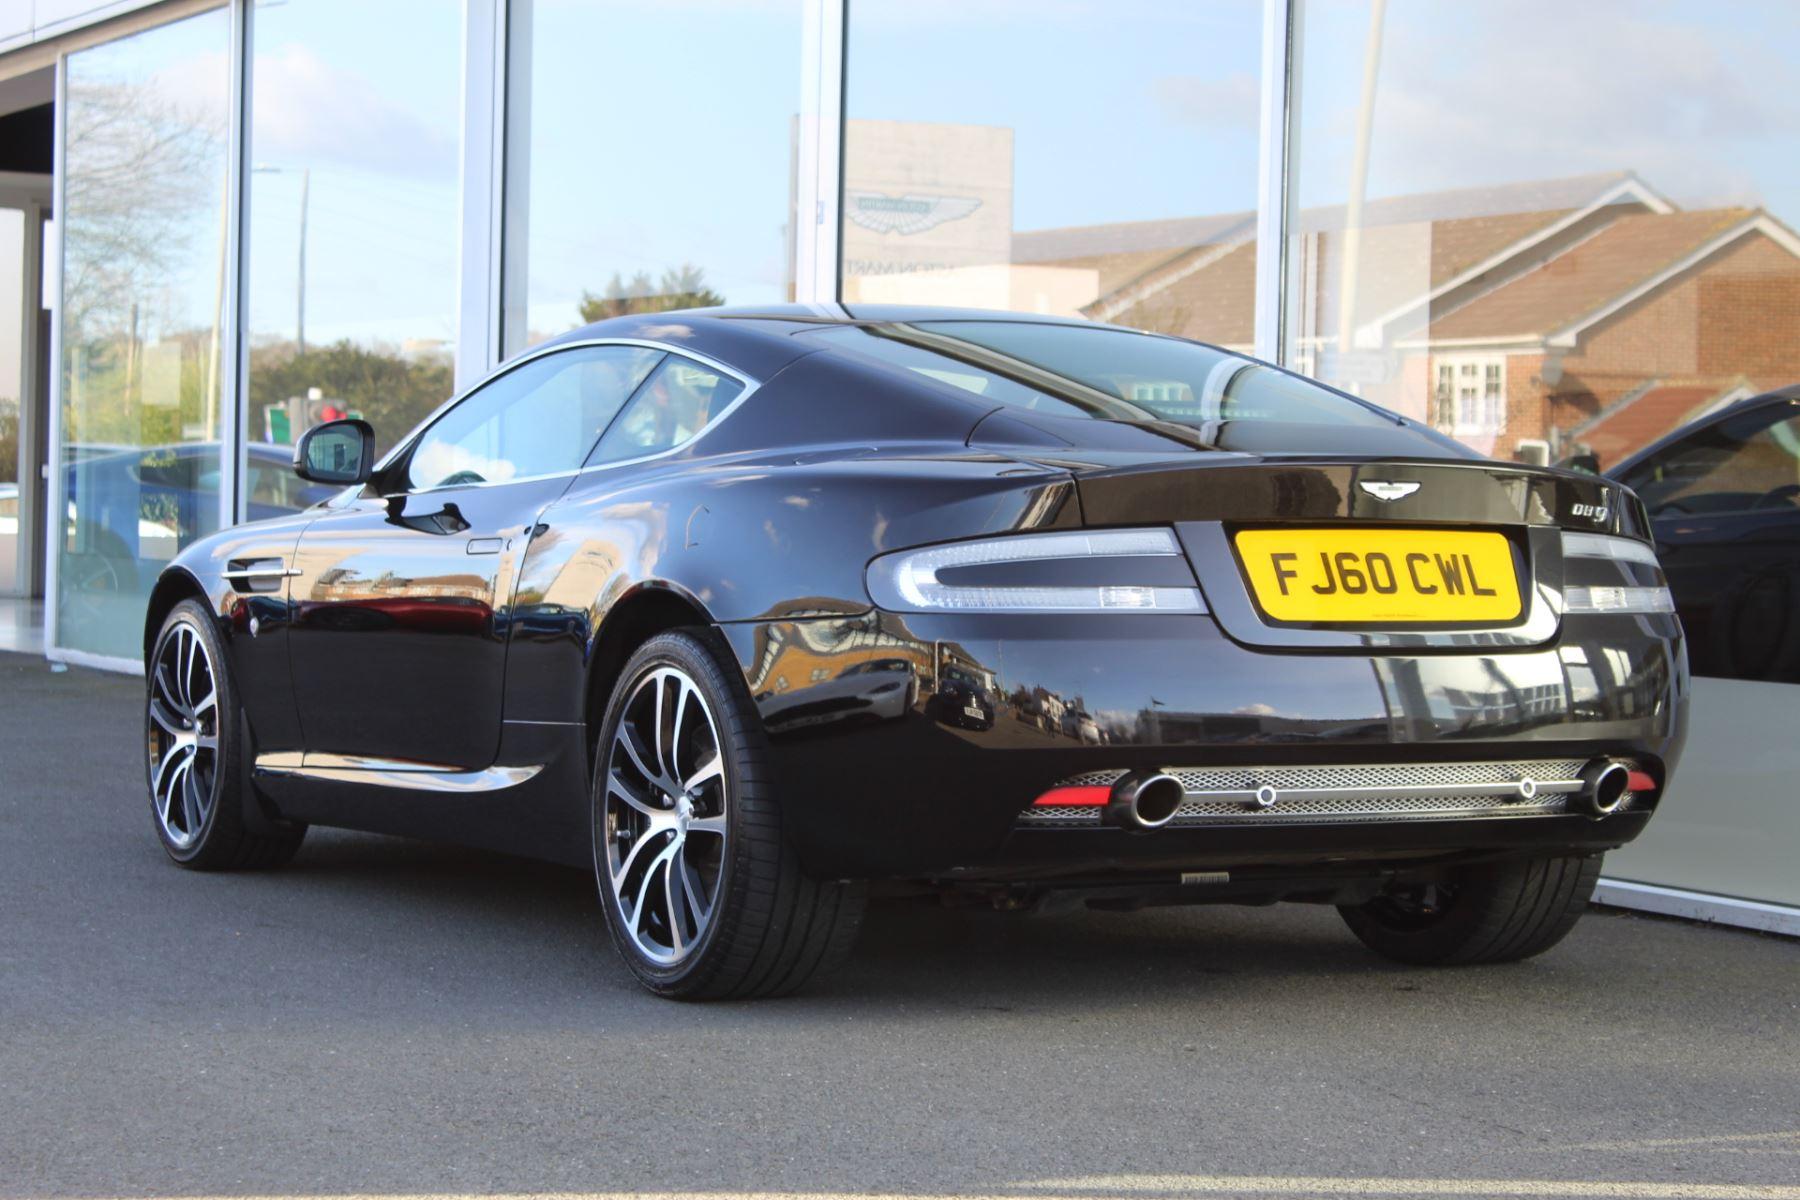 Aston Martin DB9 V12 2dr Touchtronic [470] image 19